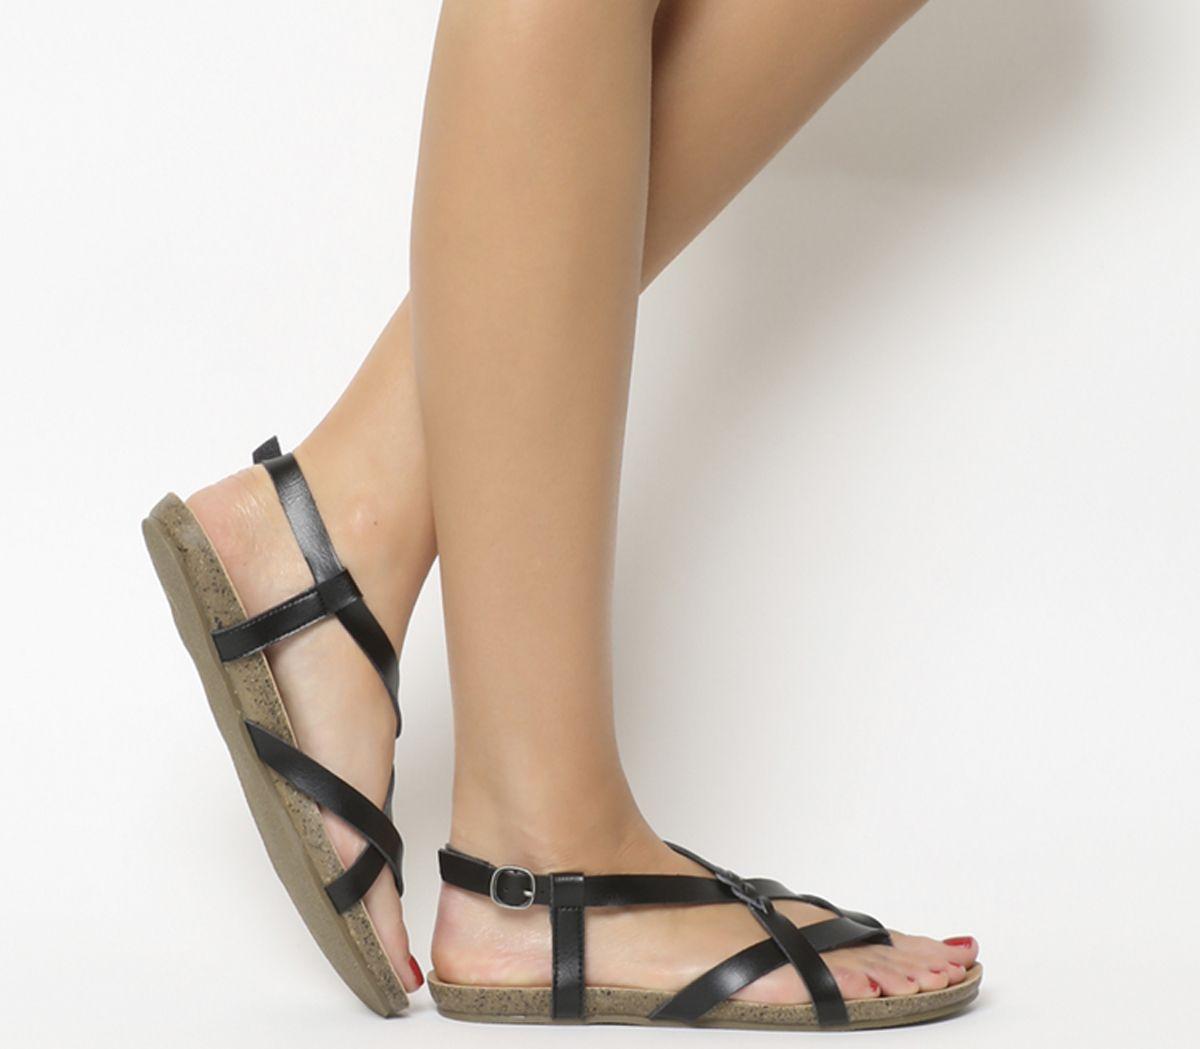 f8048aecf3 Blowfish Granola B Sandals Black Dye Cut - Sandals